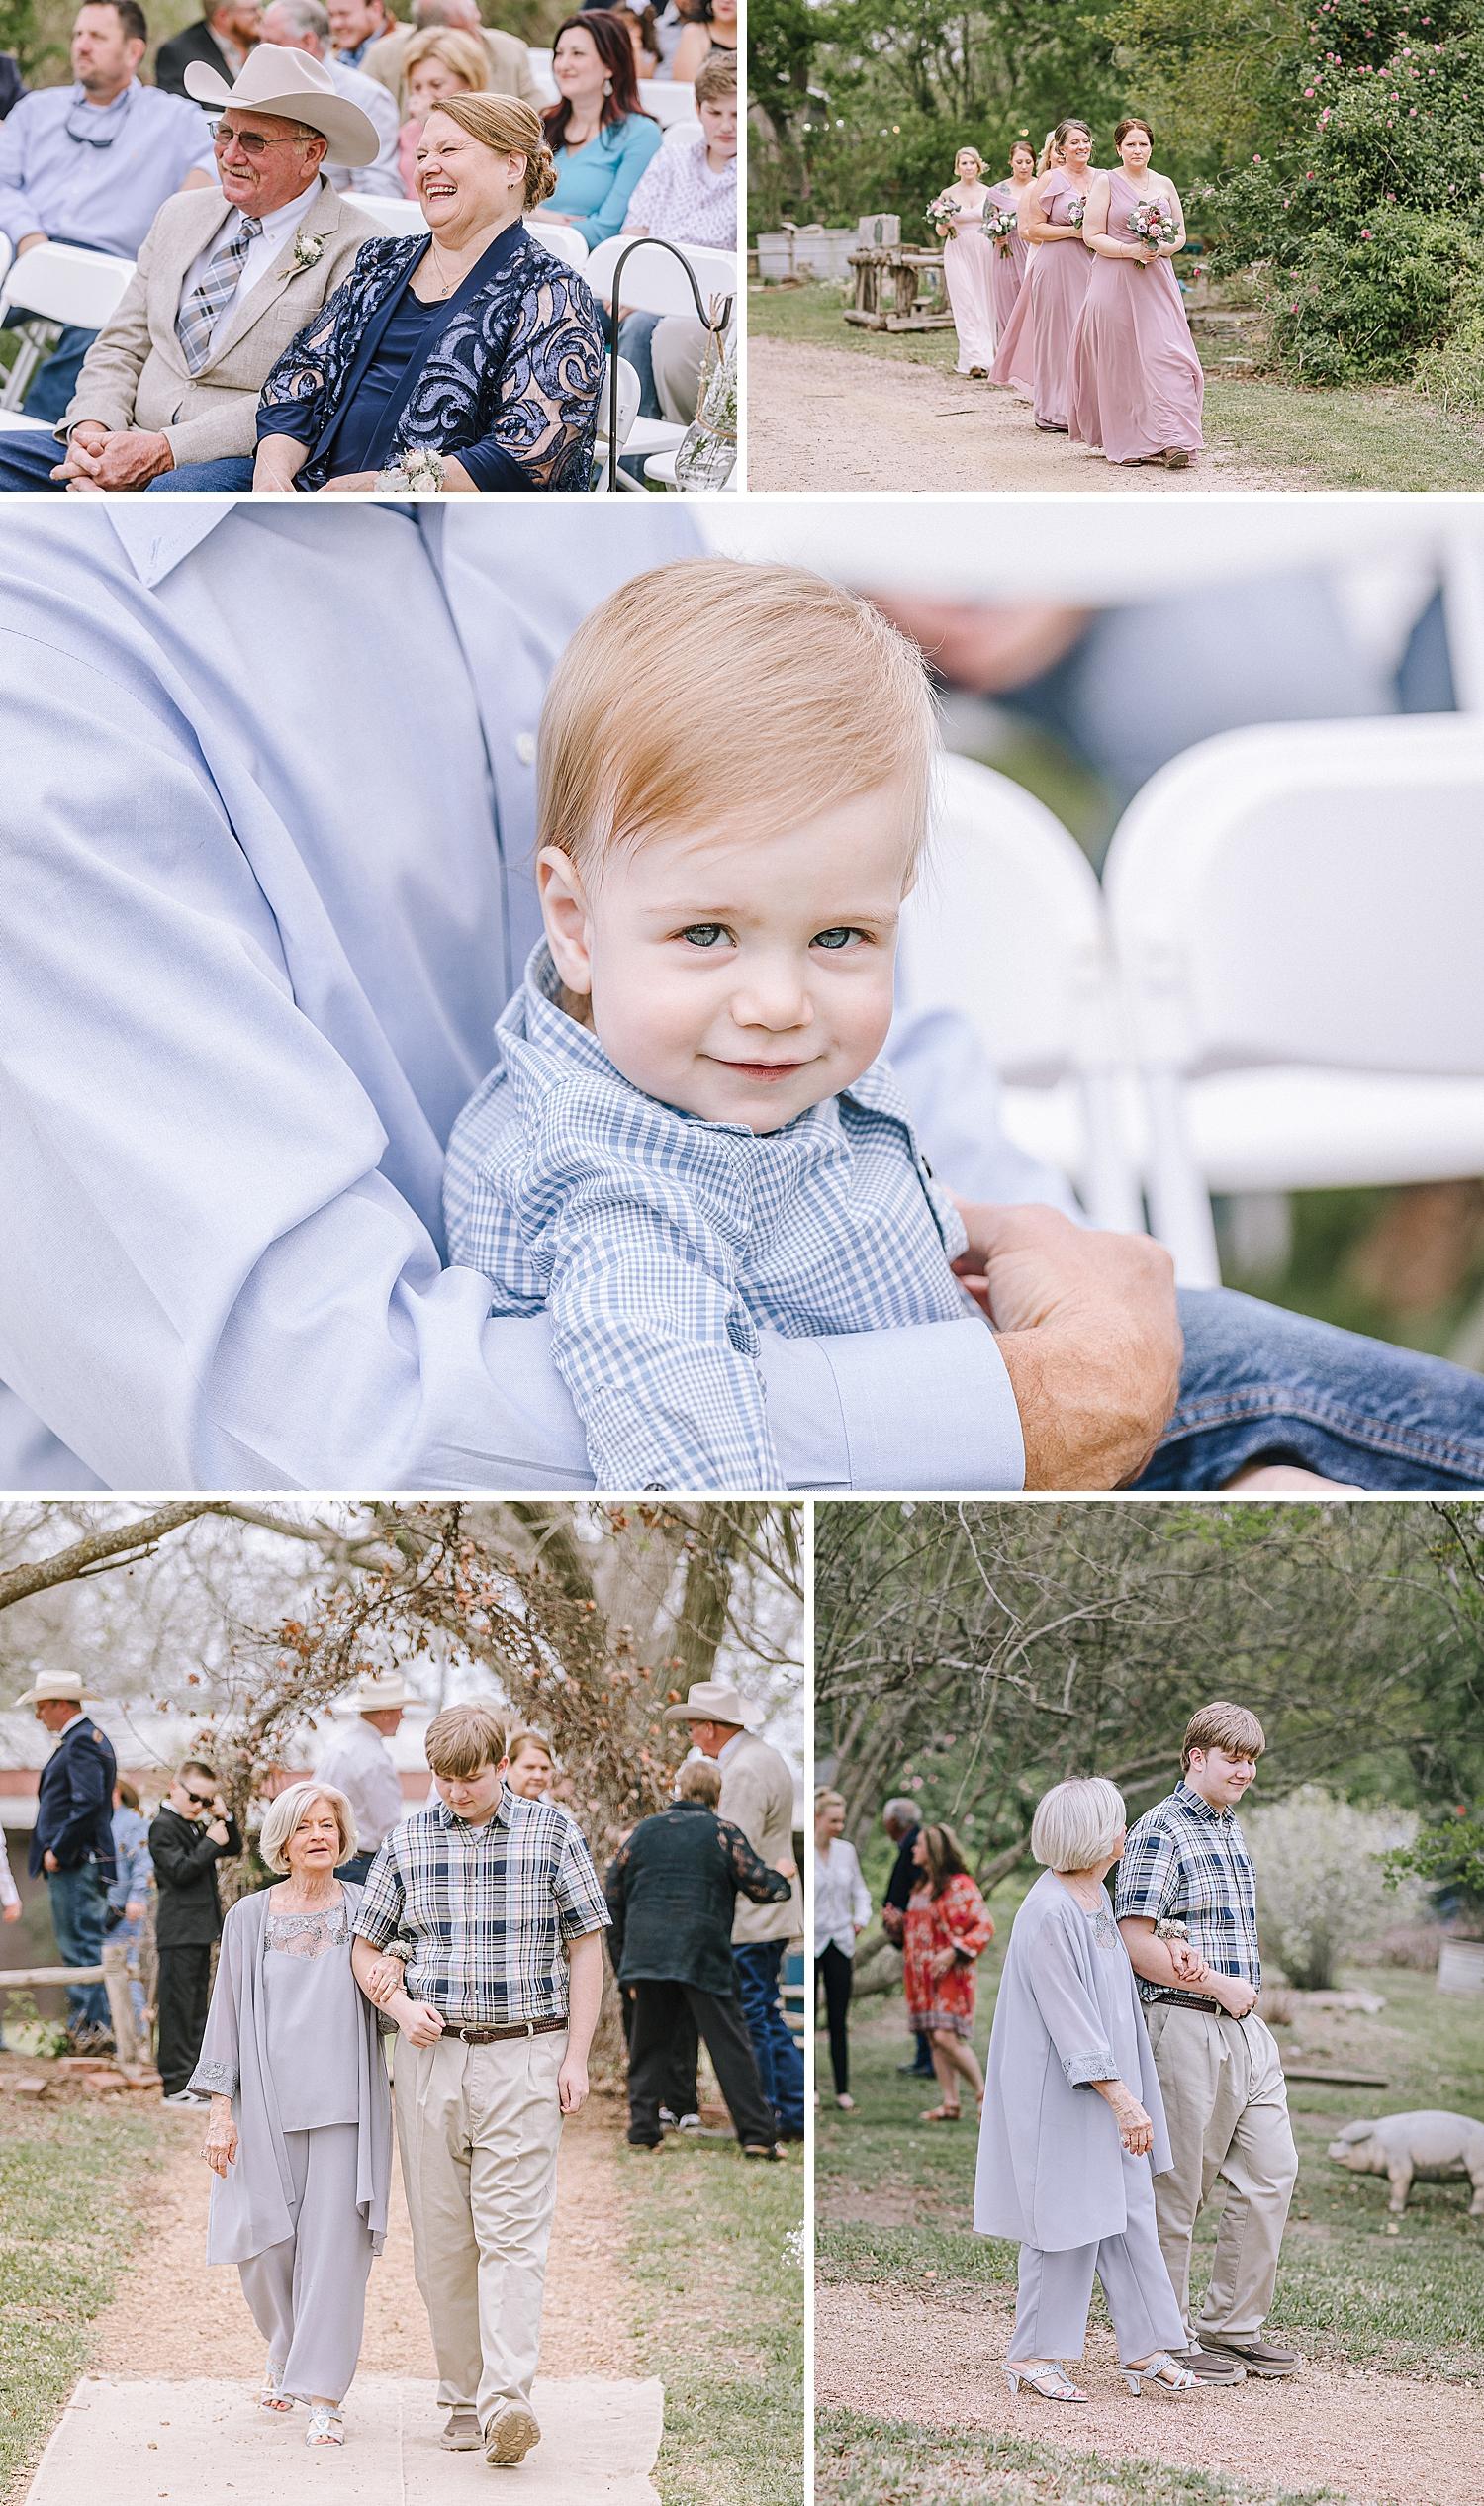 Rio-Cibilo-Ranch-Marion-Texas-Wedding-Rustic-Blush-Rose-Quartz-Details-Carly-Barton-Photography_0034.jpg